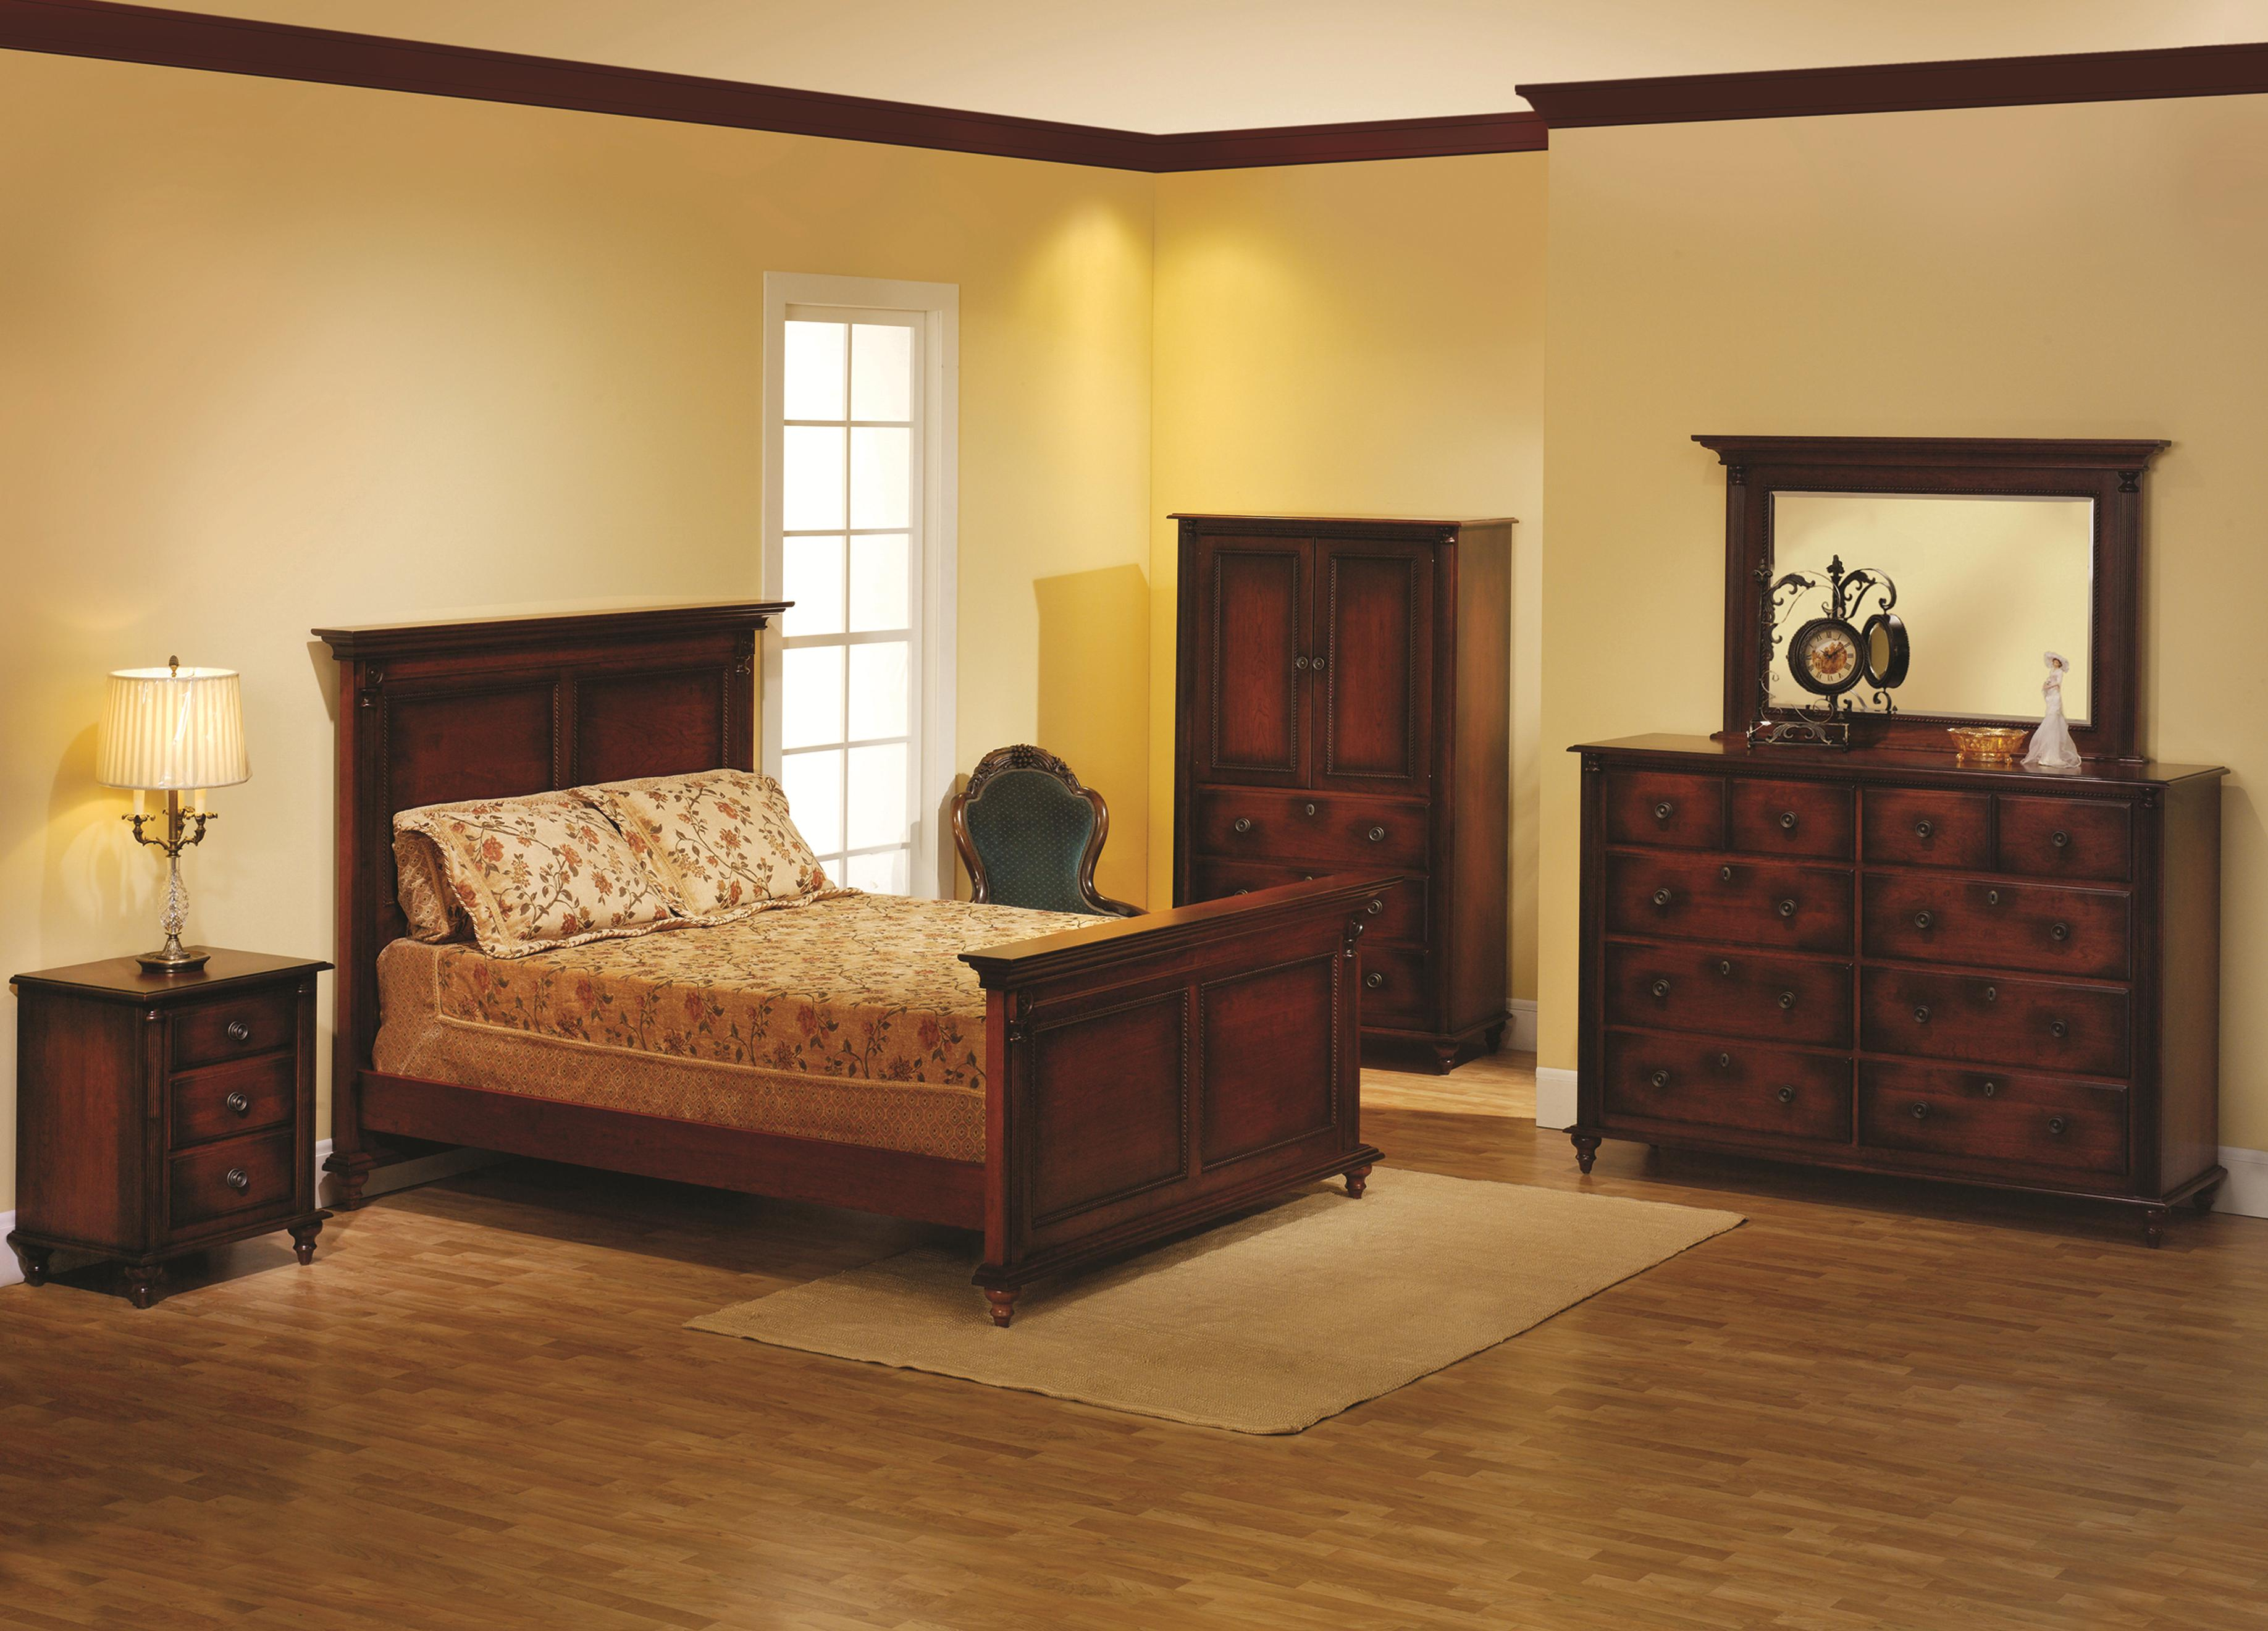 Fur Elise King Panel Bed Bedroom Group by Millcraft at Saugerties Furniture Mart